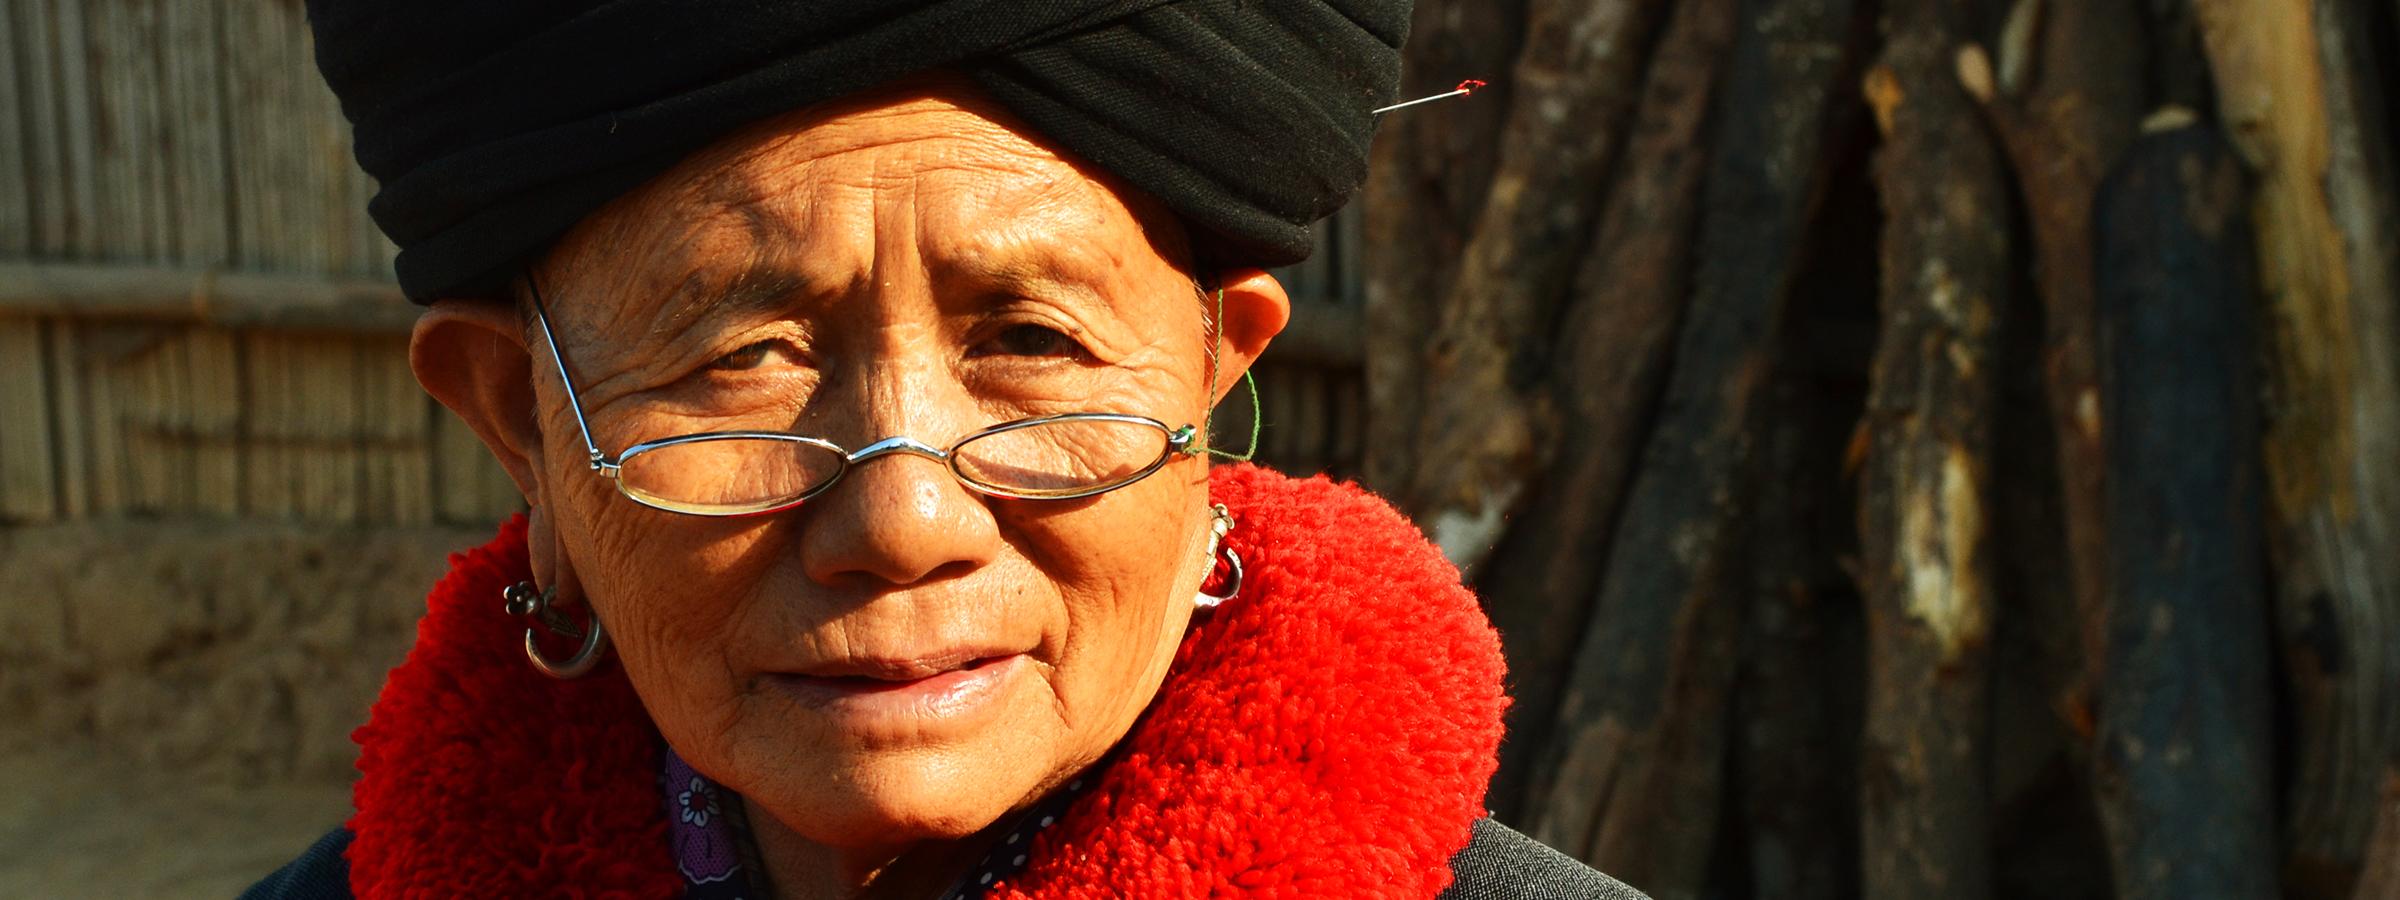 Phou Iu Travel & Ecotours, Laos